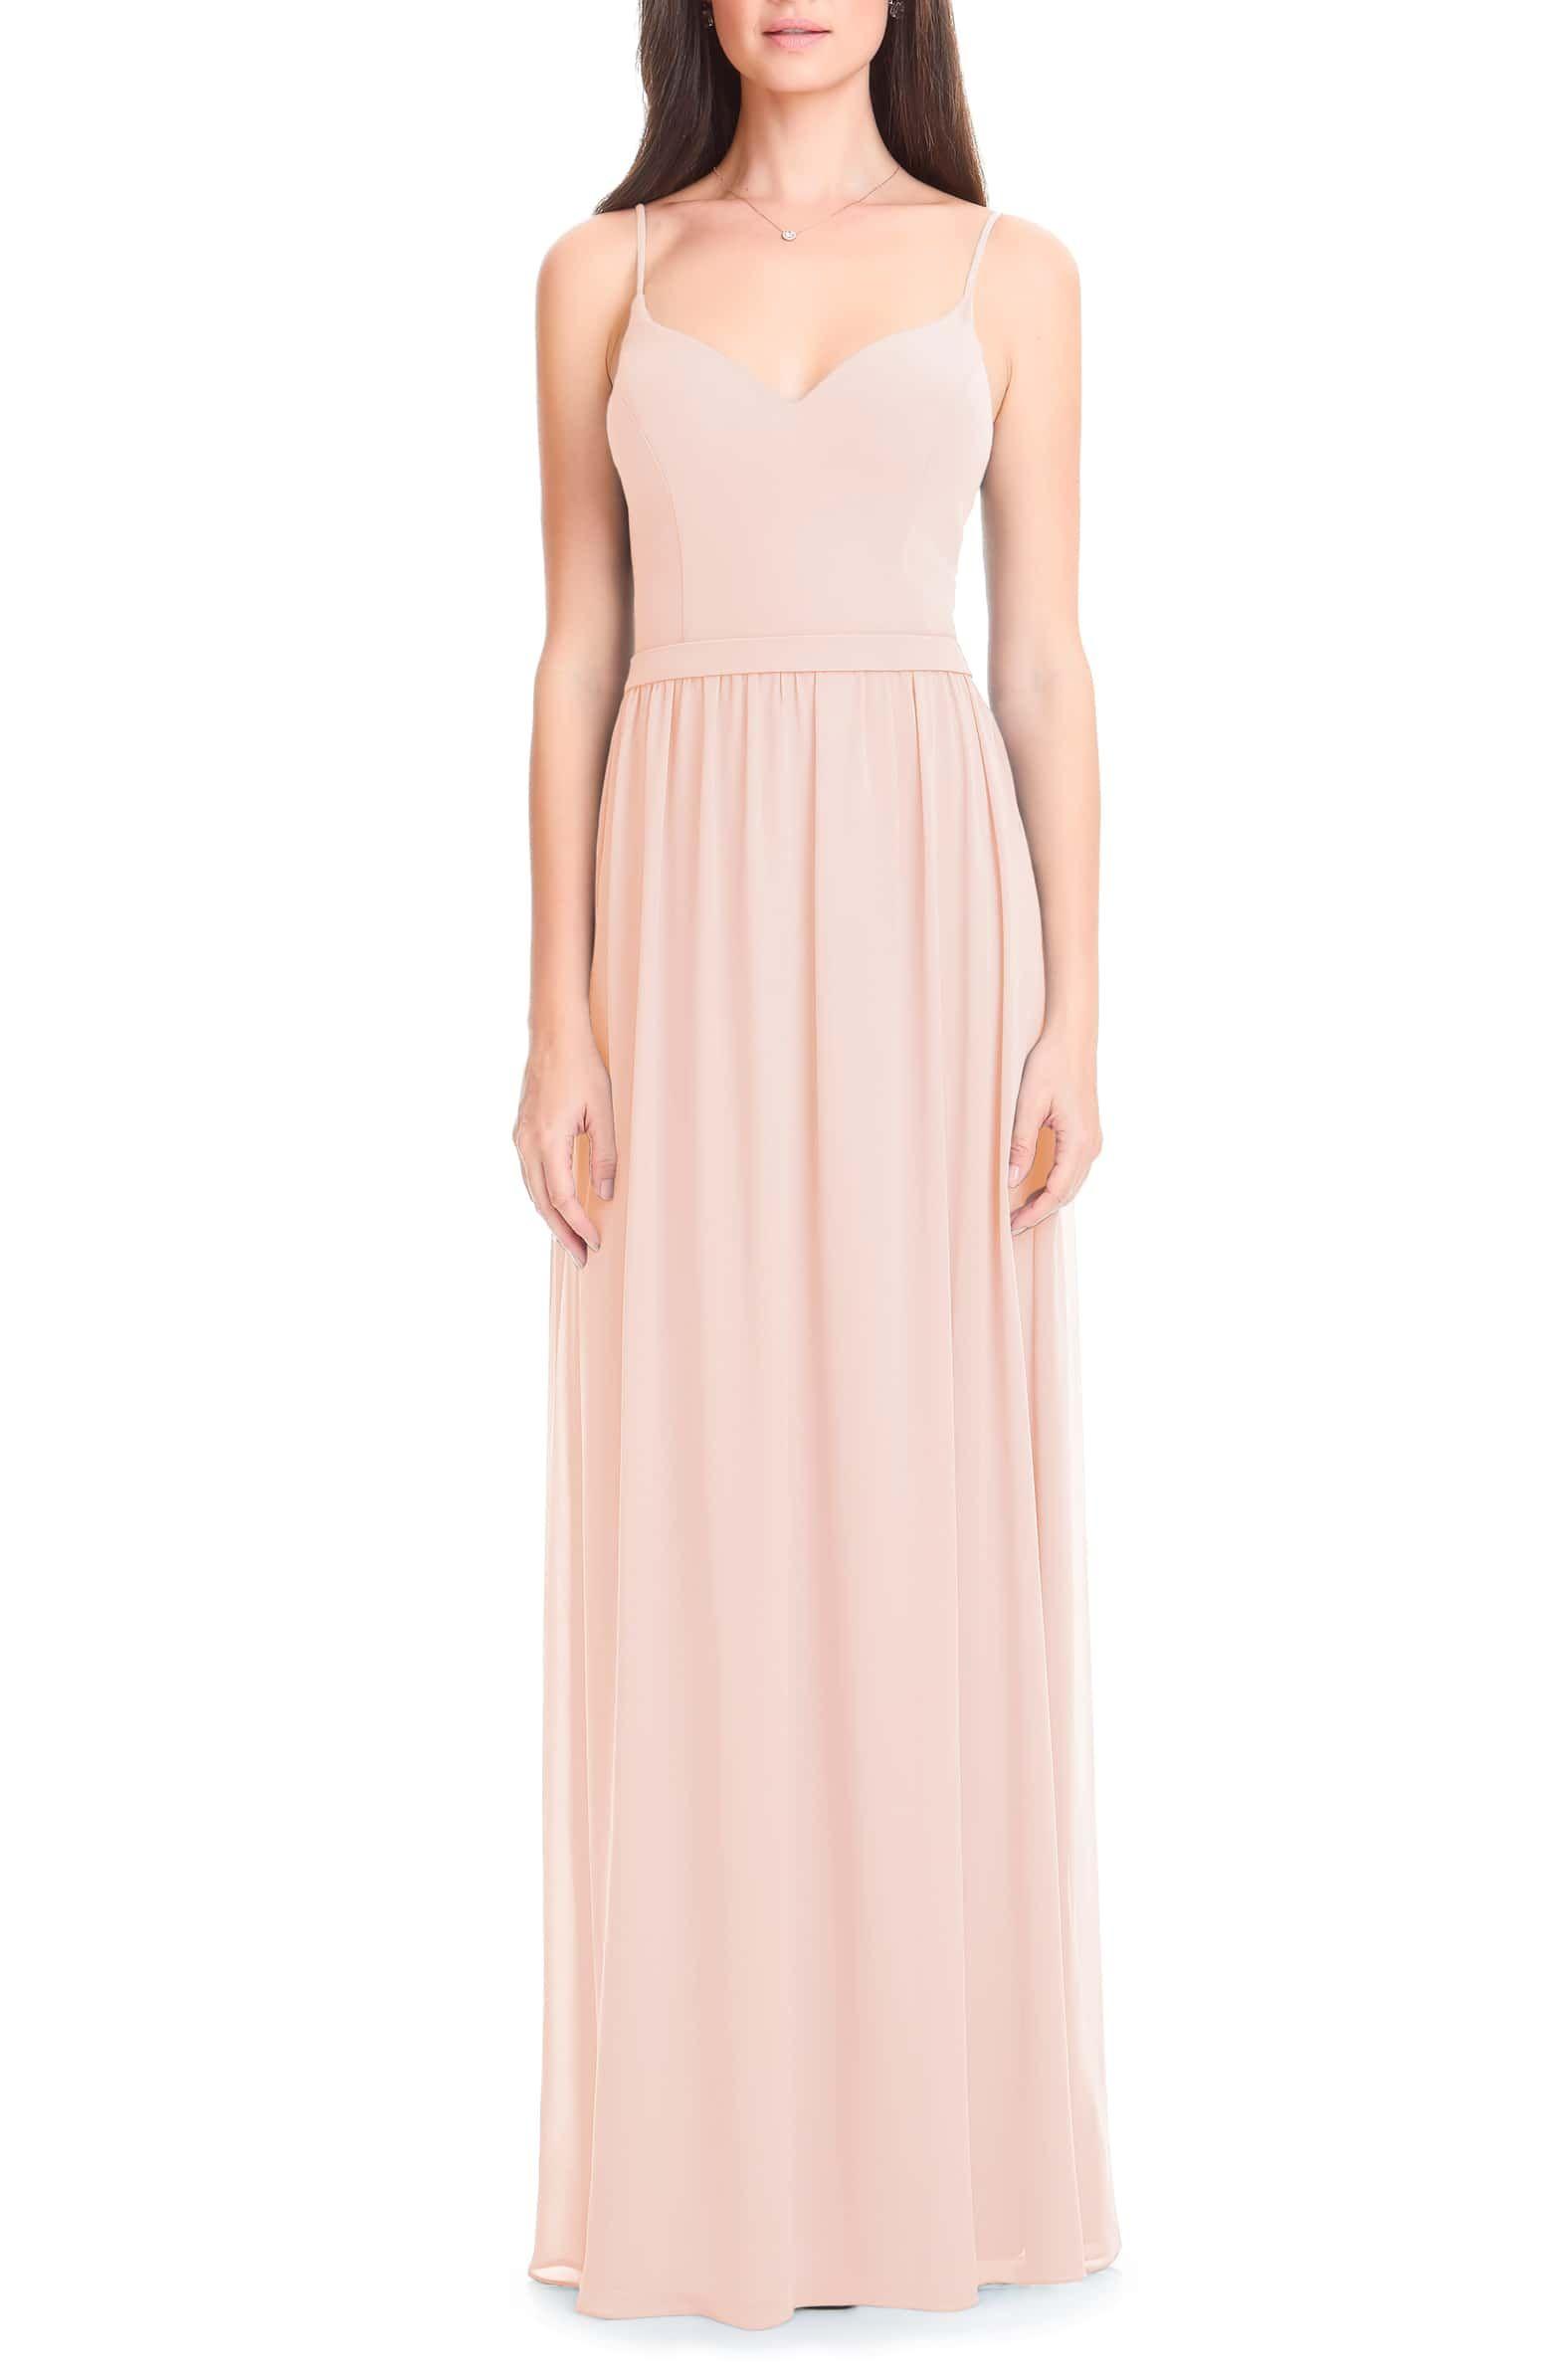 b4893d26948d Levkoff Chiffon Gown, Main, color, PETAL PINK   Bridesmaid dresses ...